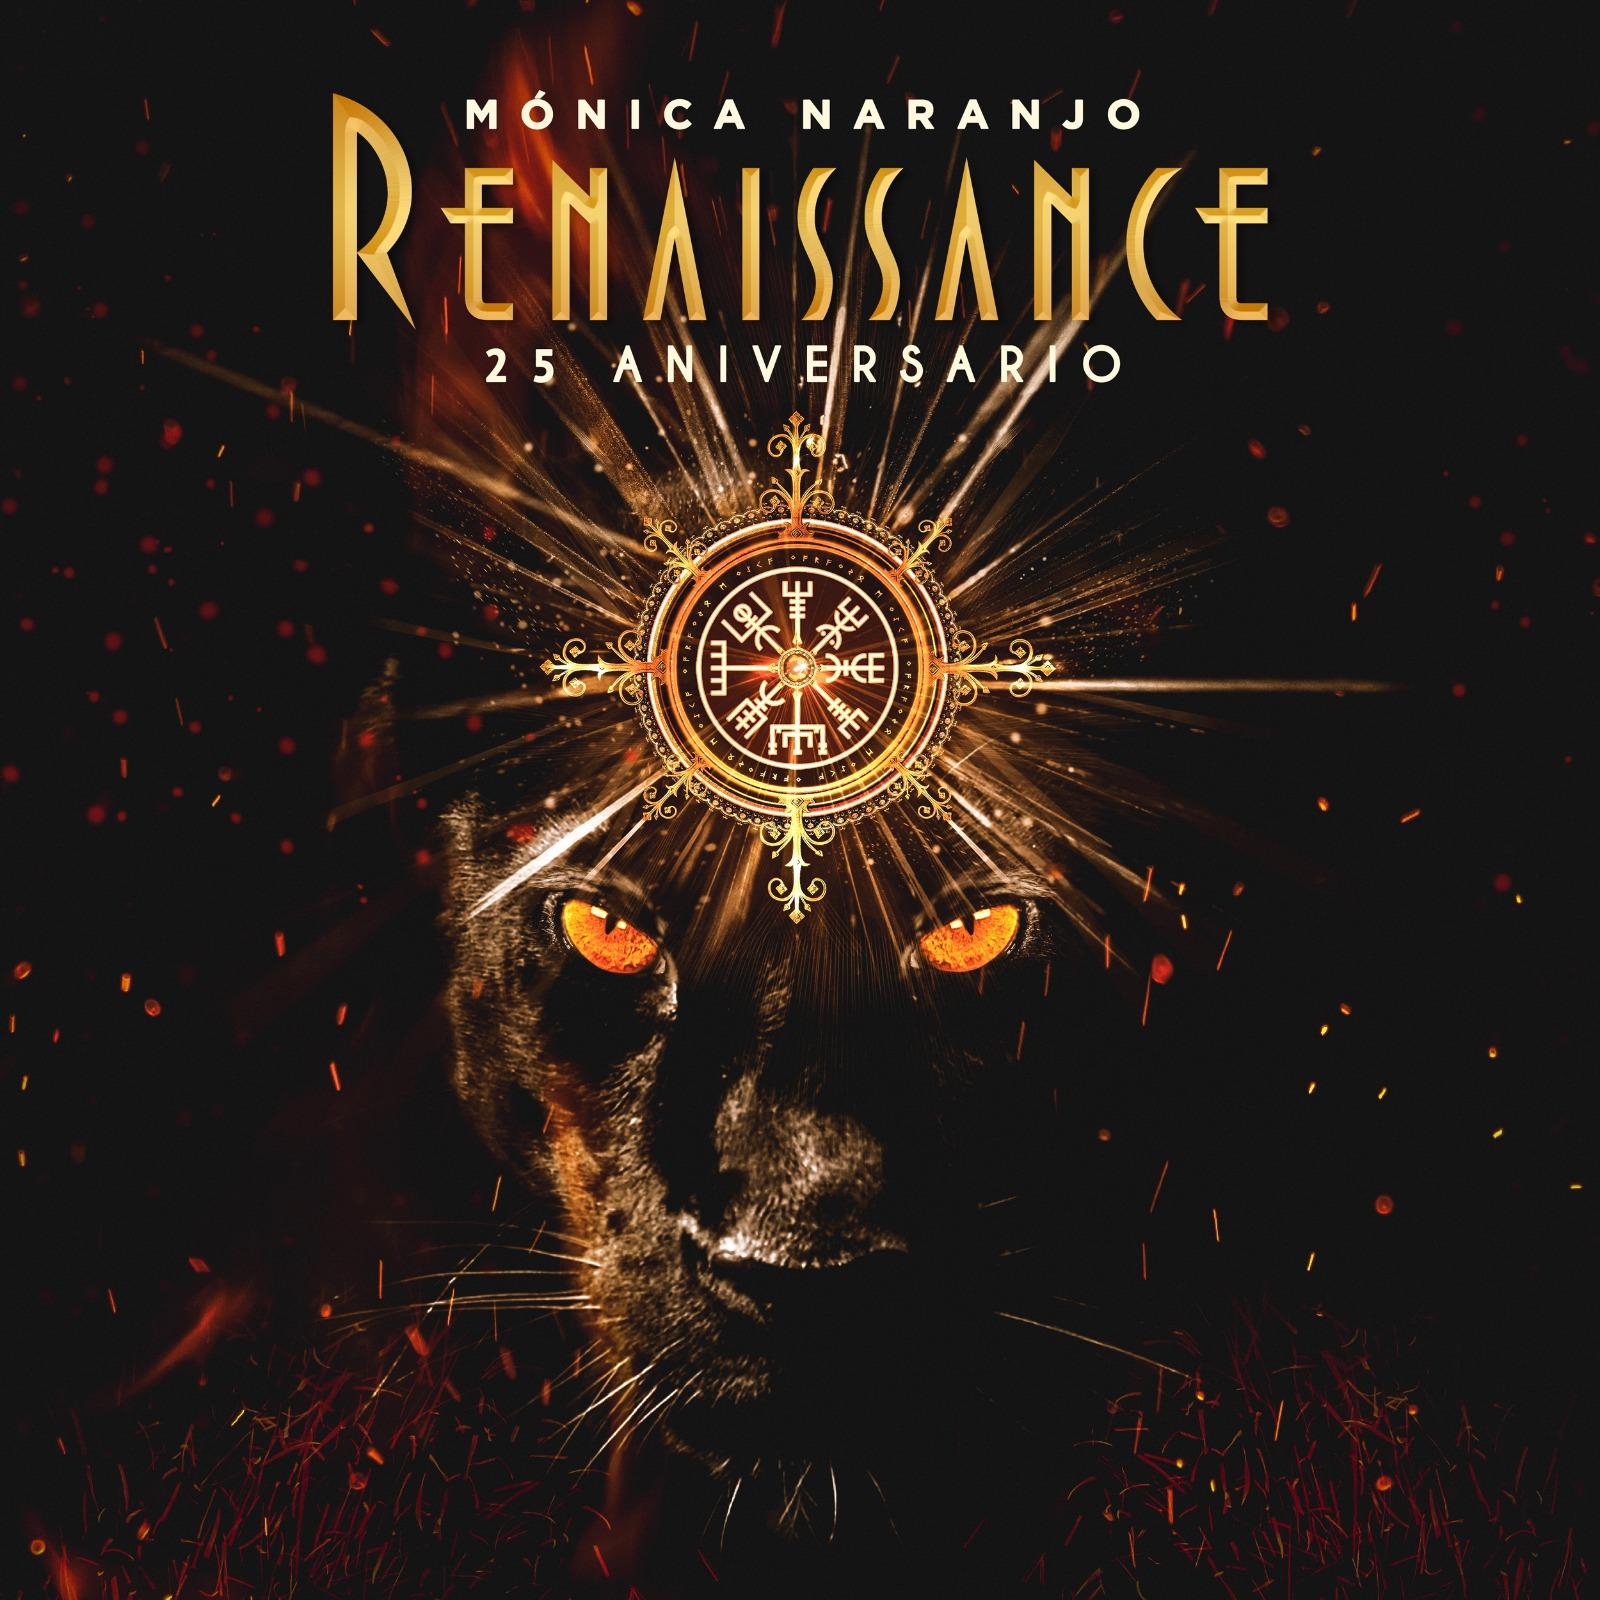 Renaissance 25 aniversario